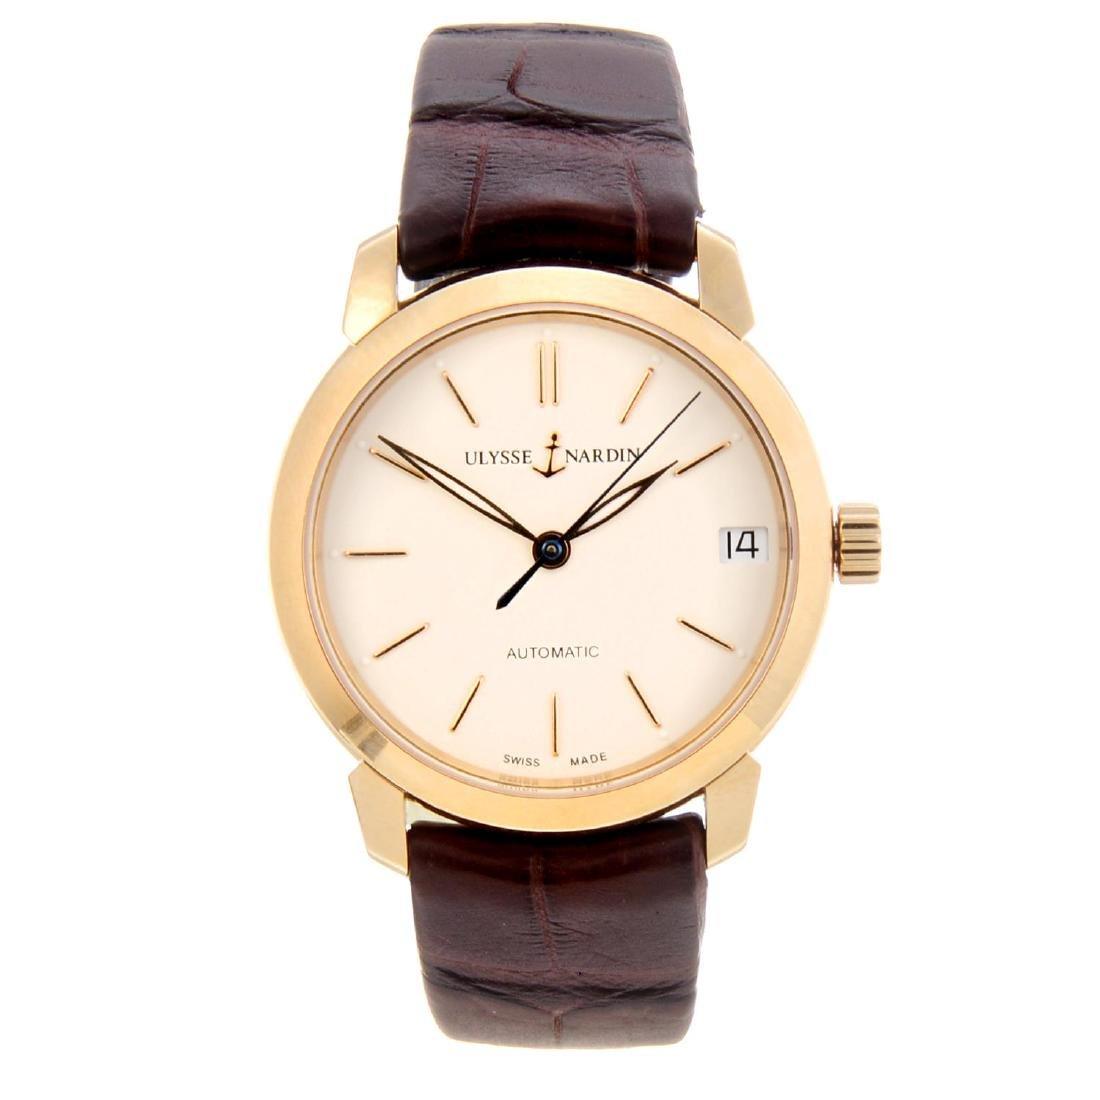 (130298) ULYSSE NARDIN - a lady's Classico wrist watch.